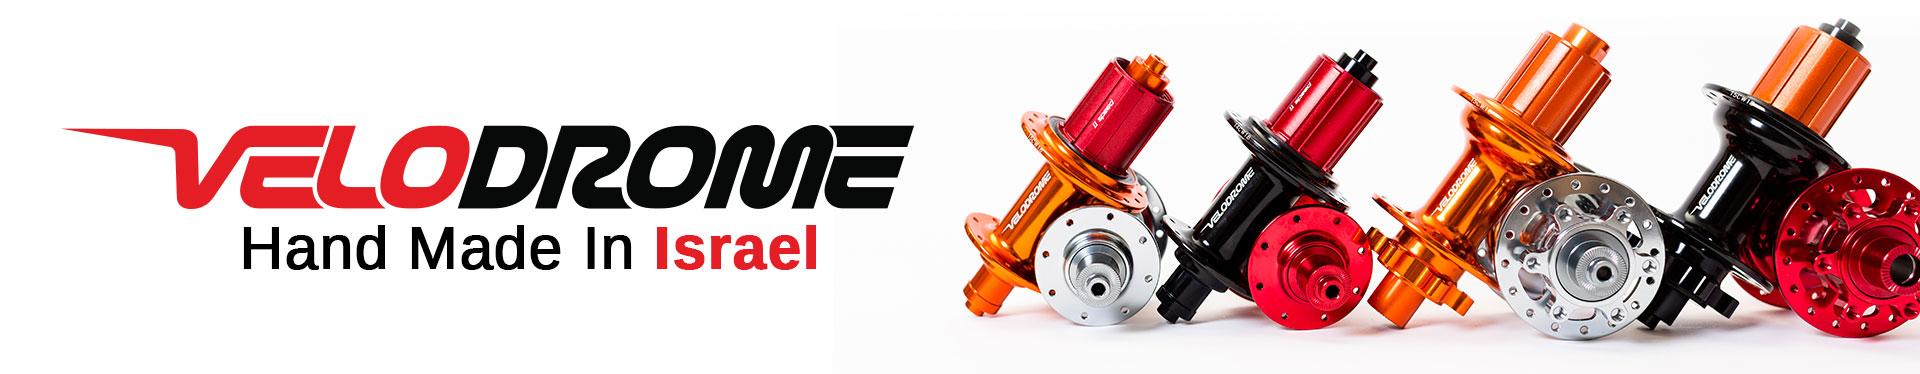 velodrome-img27